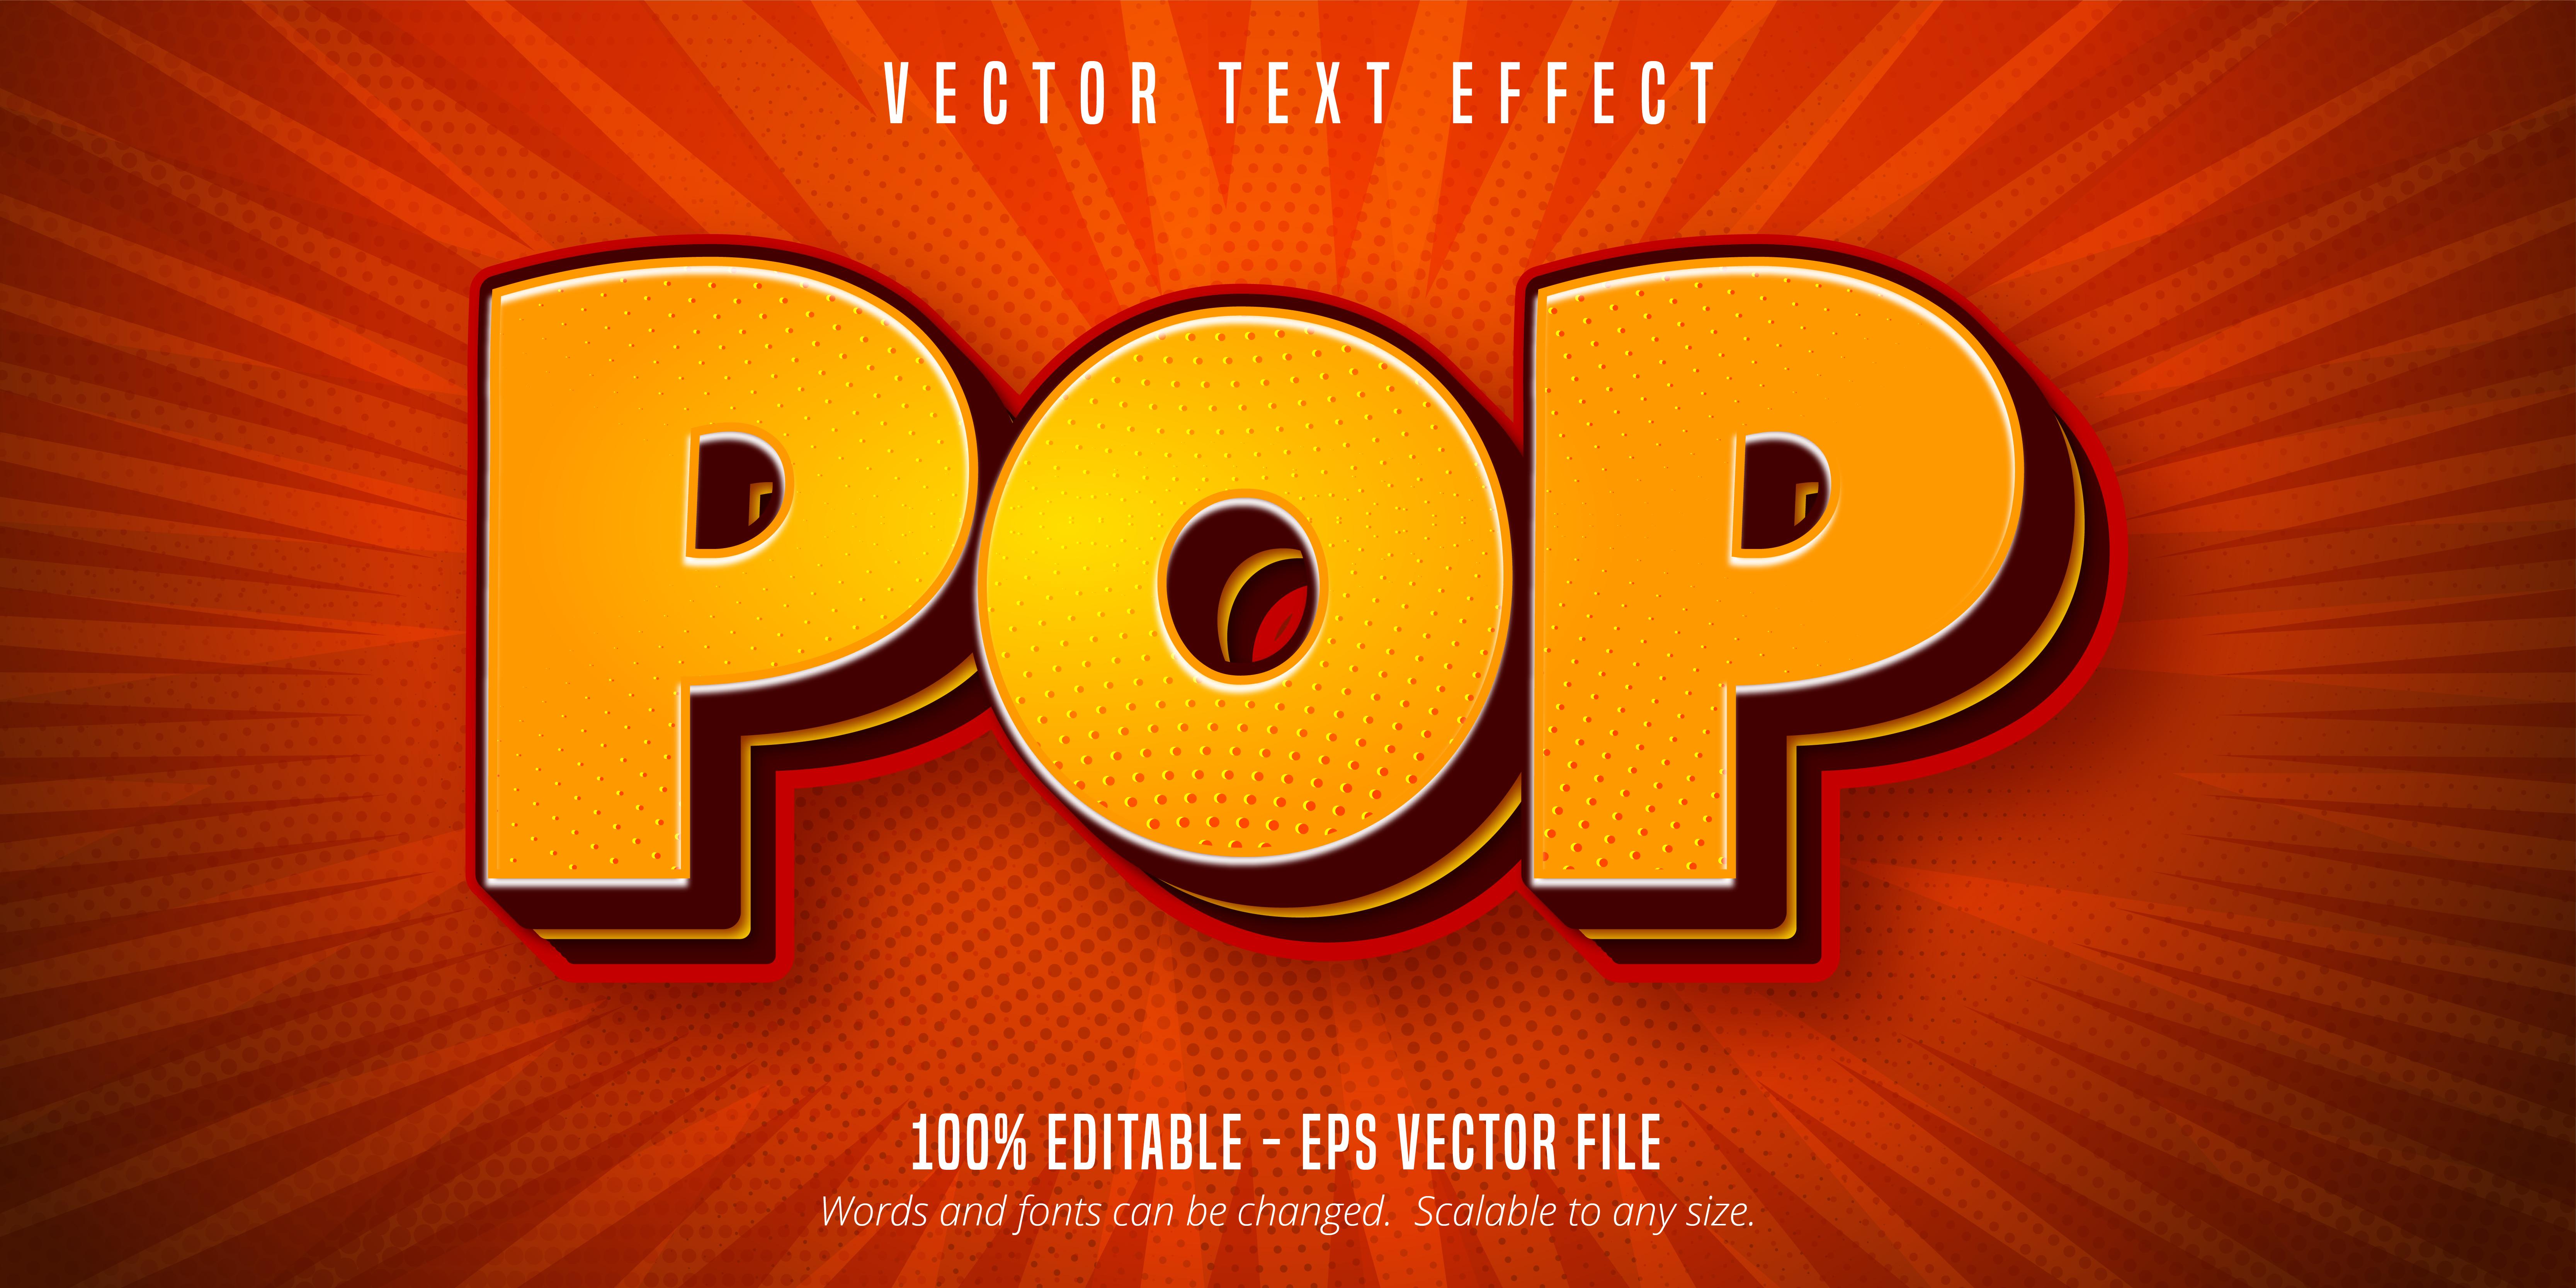 texto pop amarillo, efecto de texto estilo pop art